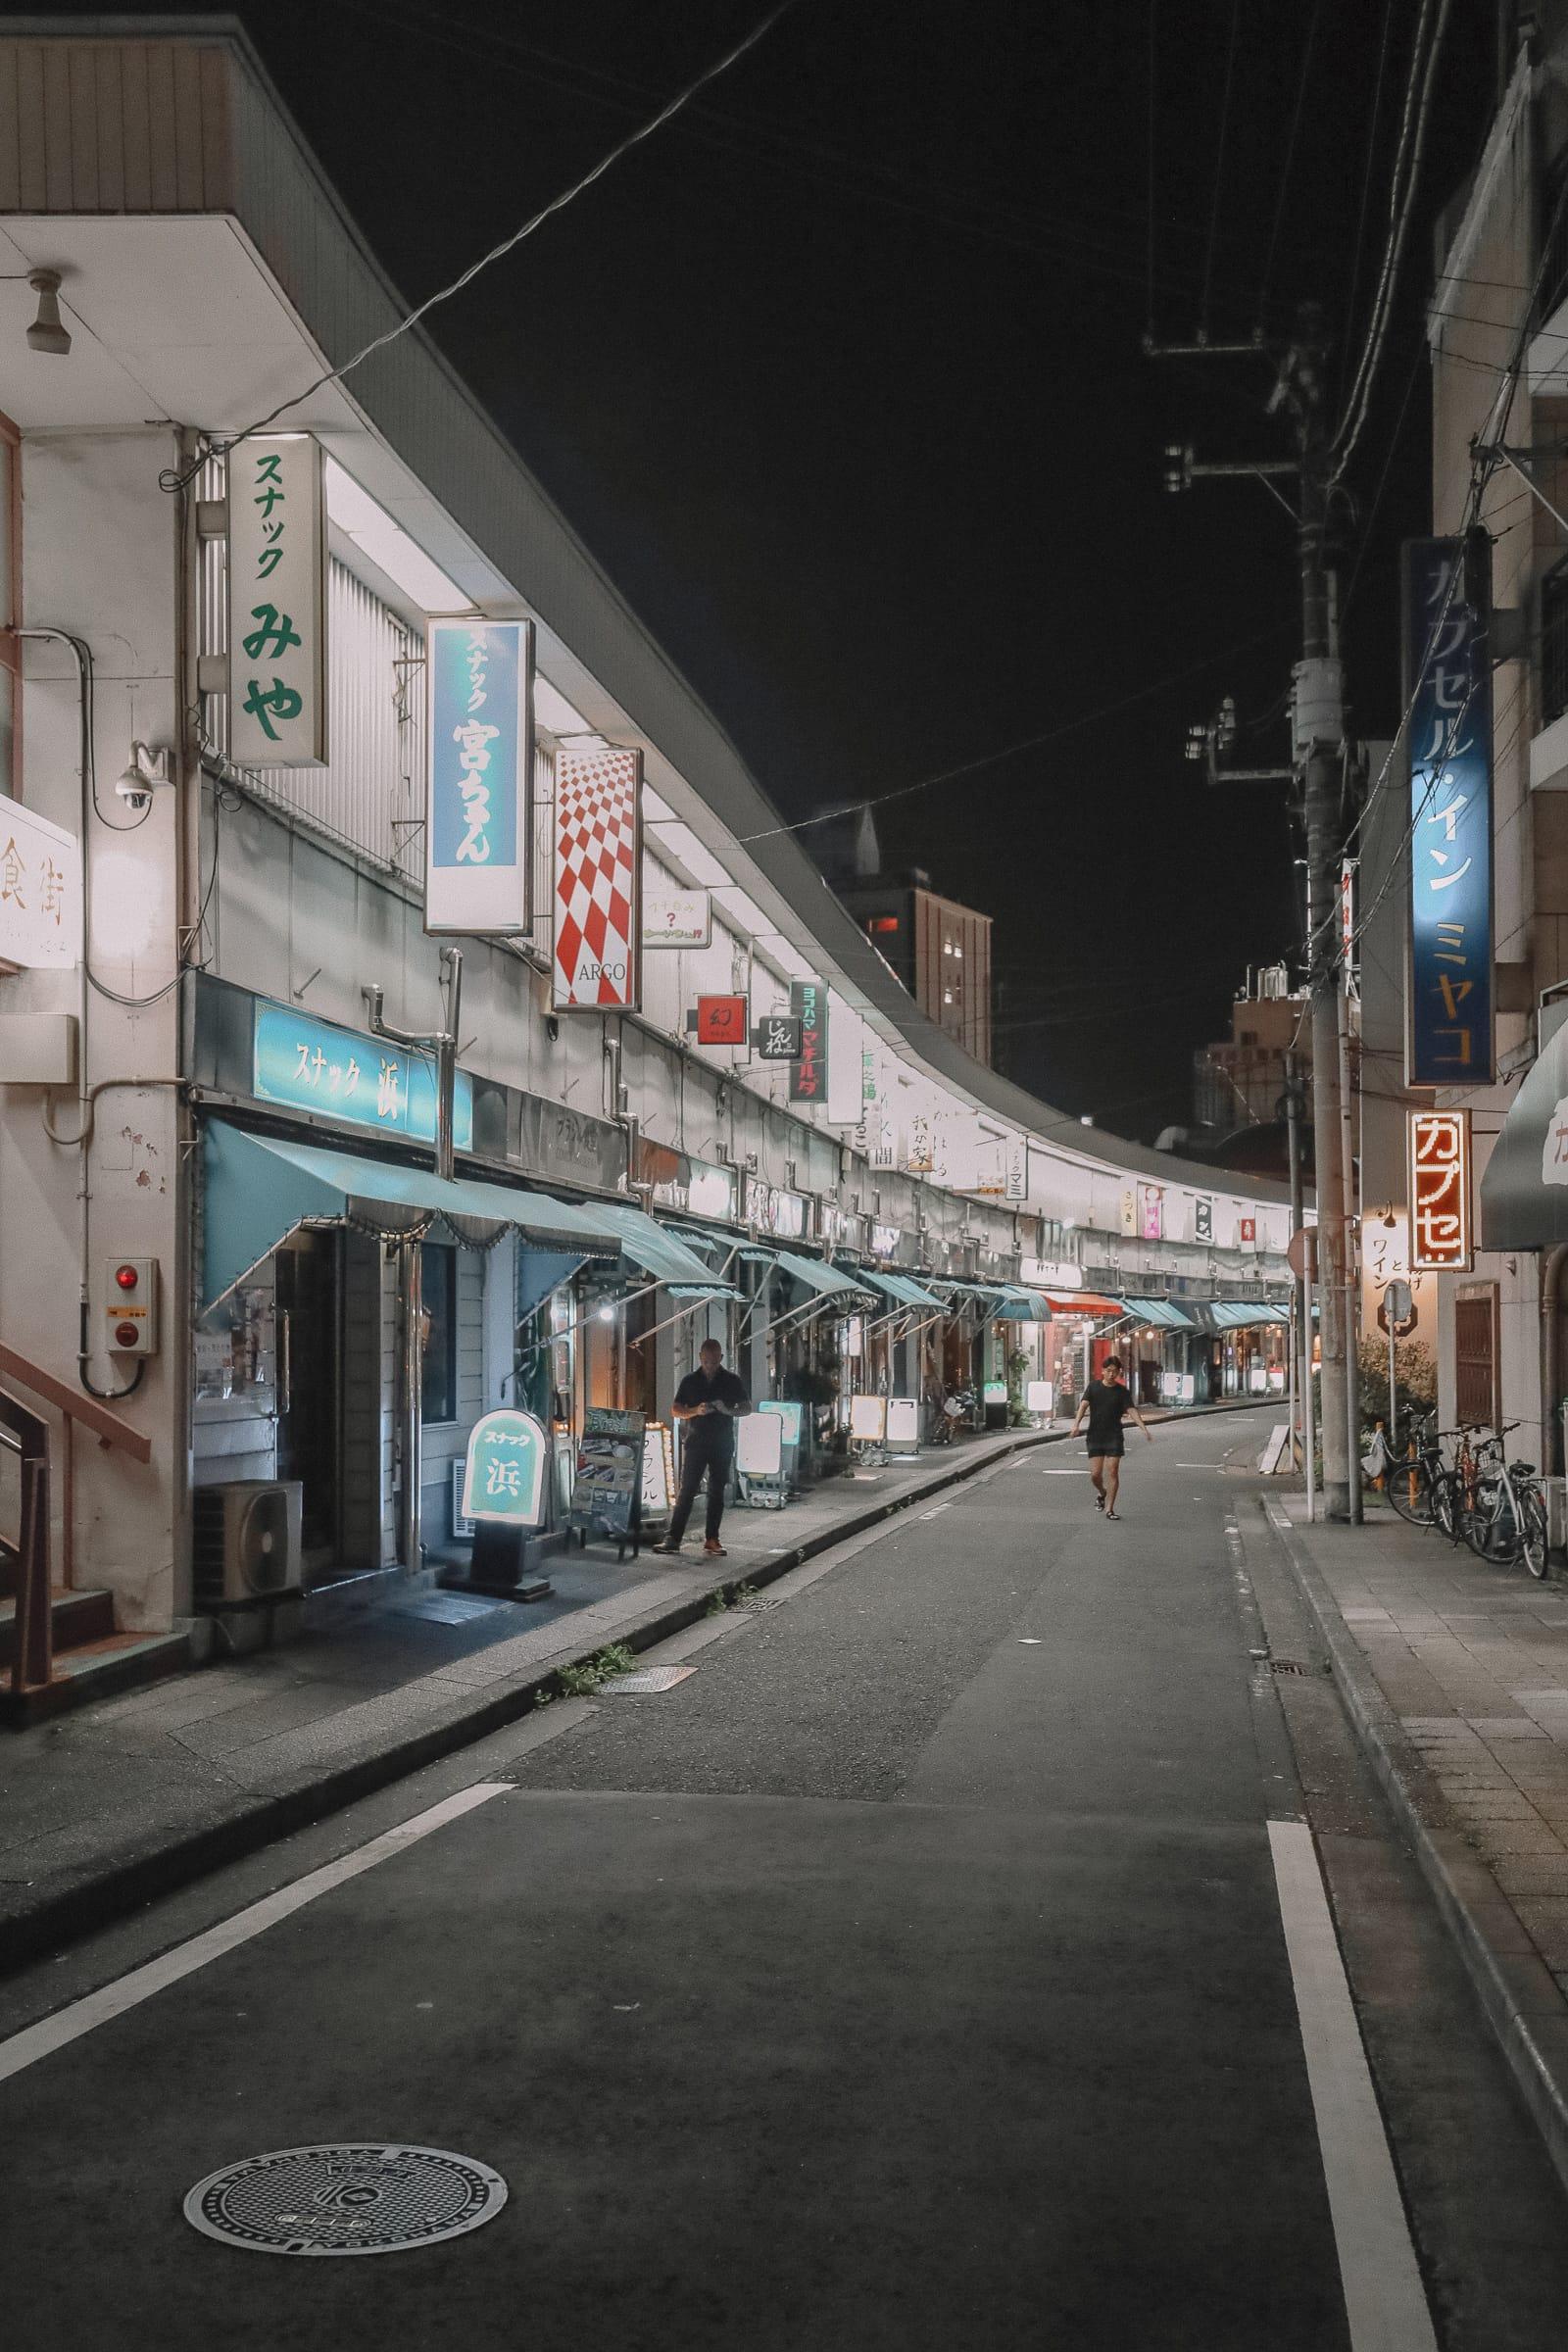 24 Hours Exploring Downtown Yokohama - Japan (4)